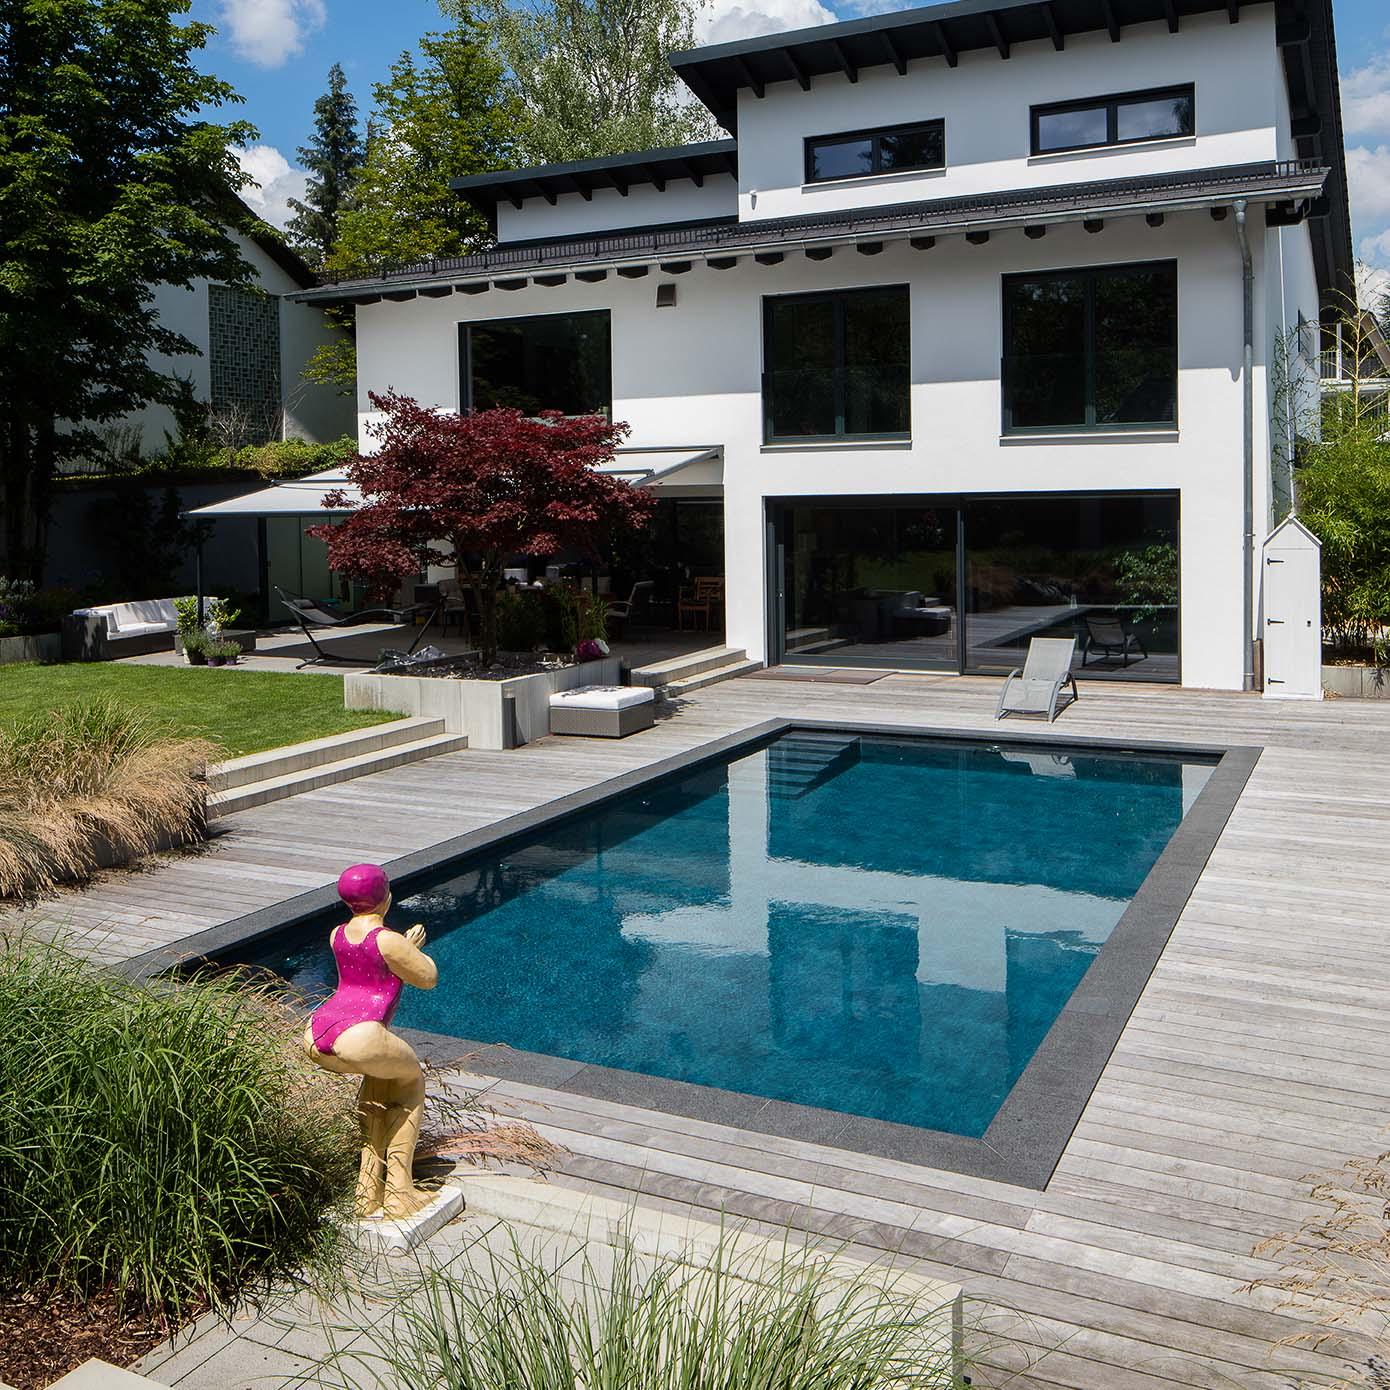 Swimmingpool mit Holzdeck